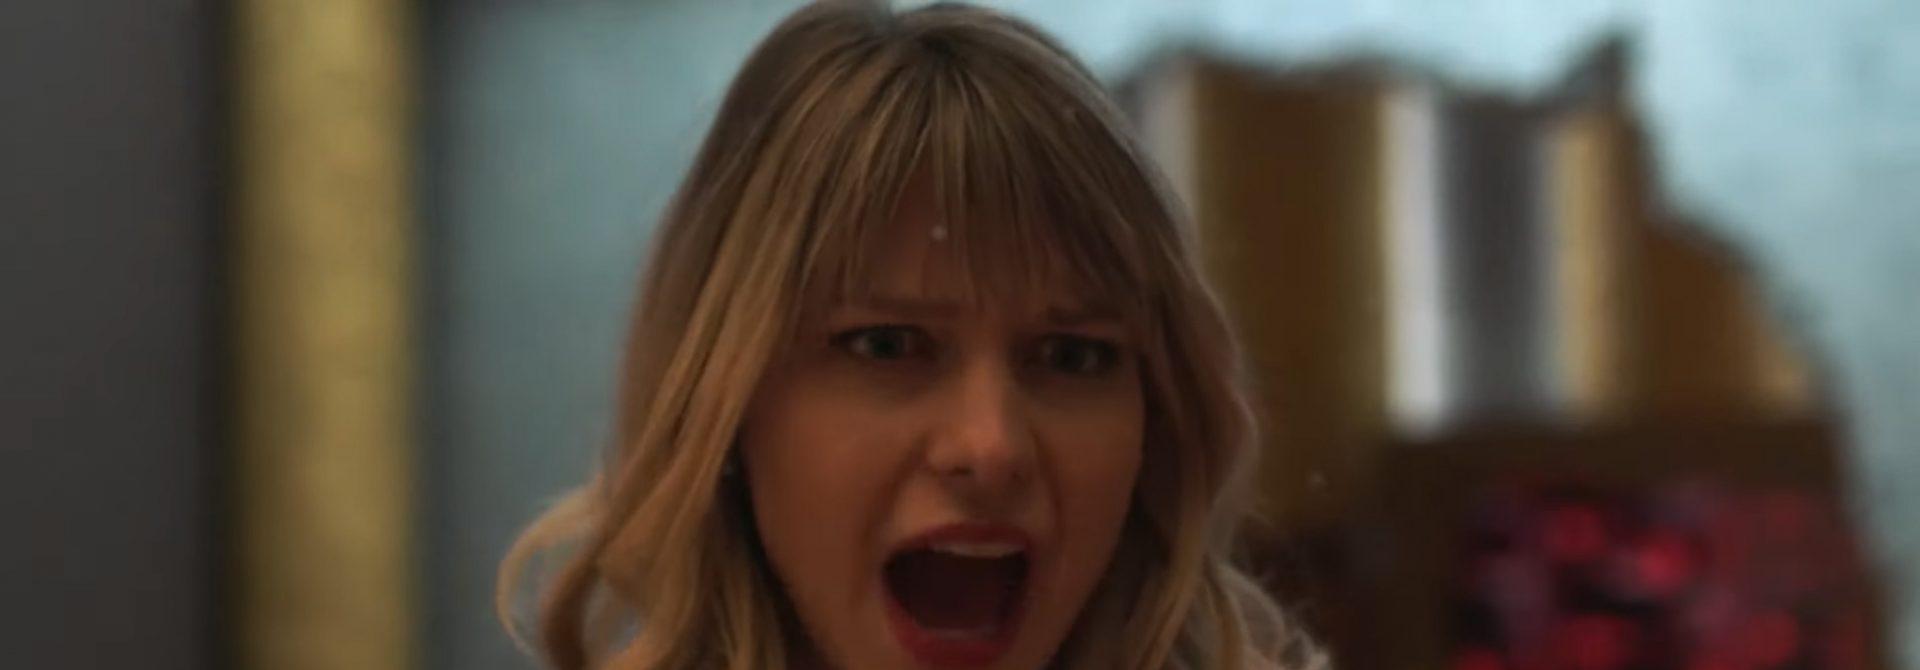 Supergirl Season 6 Trailer Released